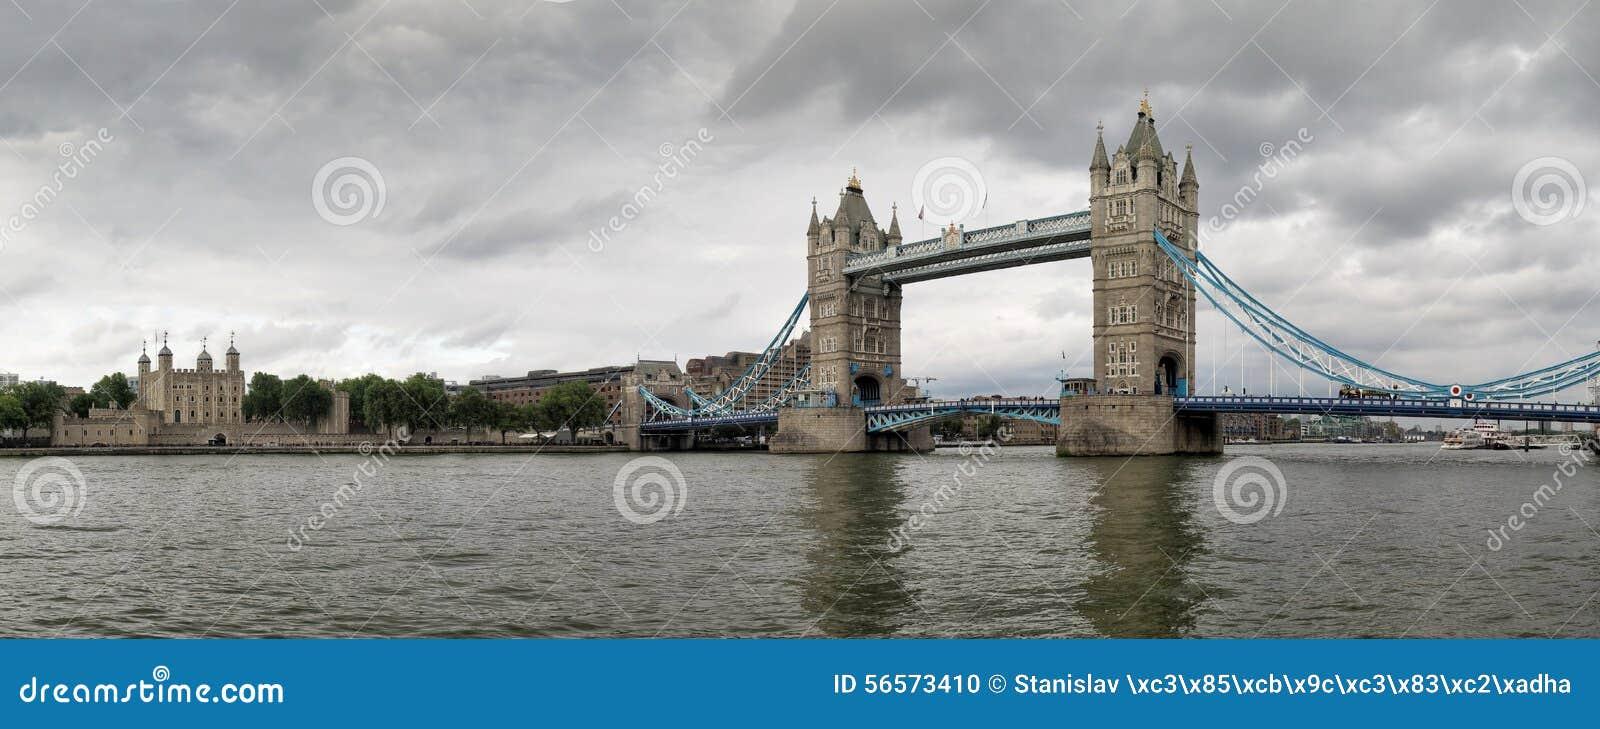 Download Λονδίνο - ποταμός Τάμεσης εκδοτική εικόνα. εικόνα από τοπίο - 56573410